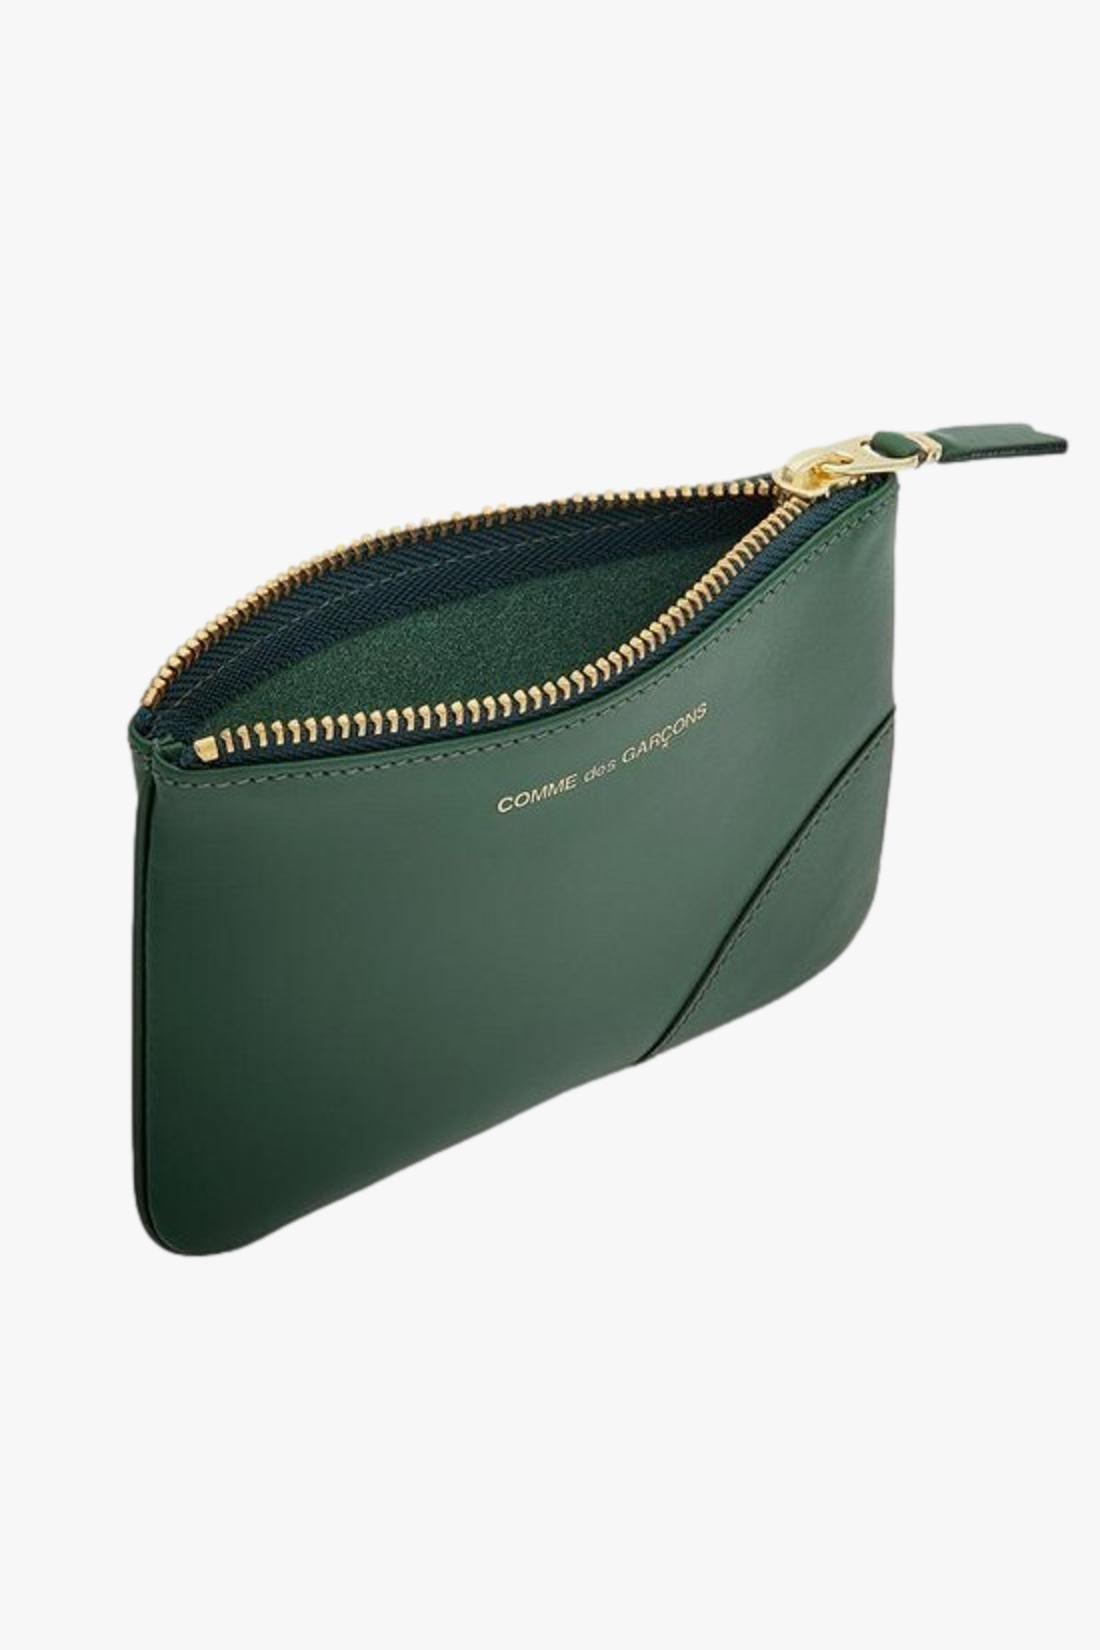 COMME DES GARÇONS WALLETS / Cdg leather wallet classic Bottle green